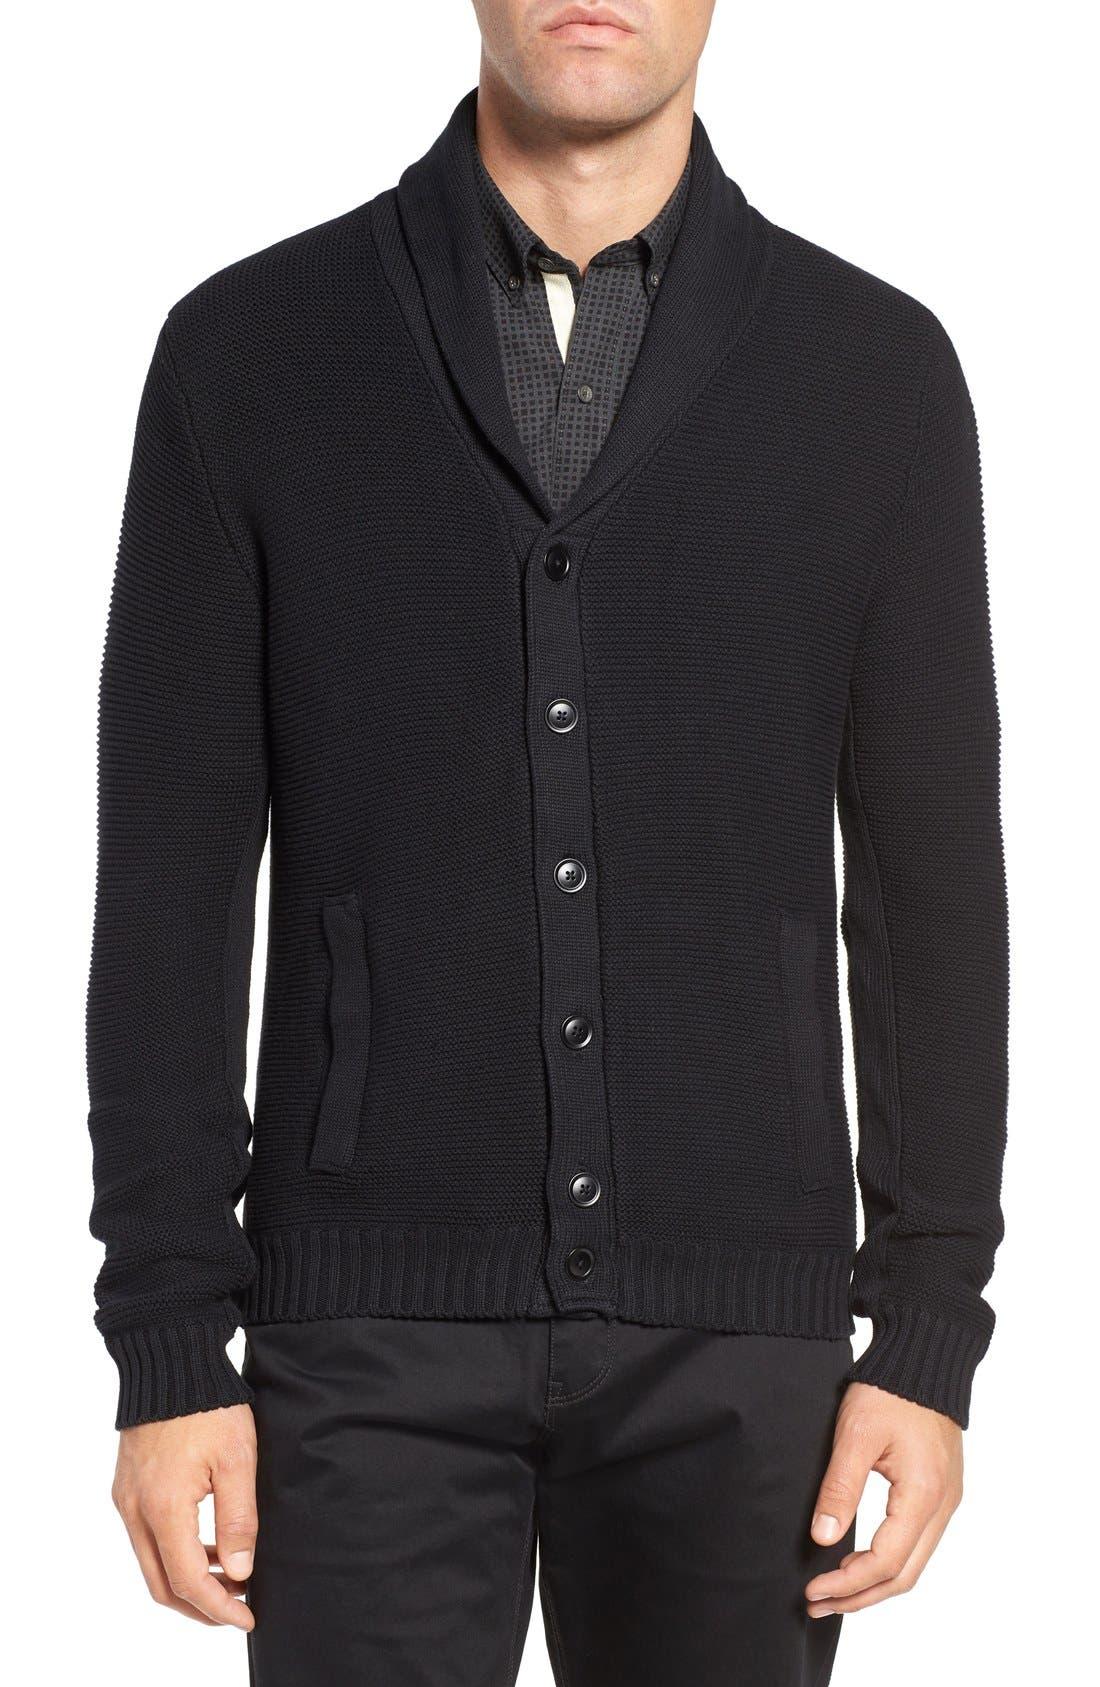 Cypress Cotton Shawl Collar Cardigan,                             Main thumbnail 1, color,                             Black